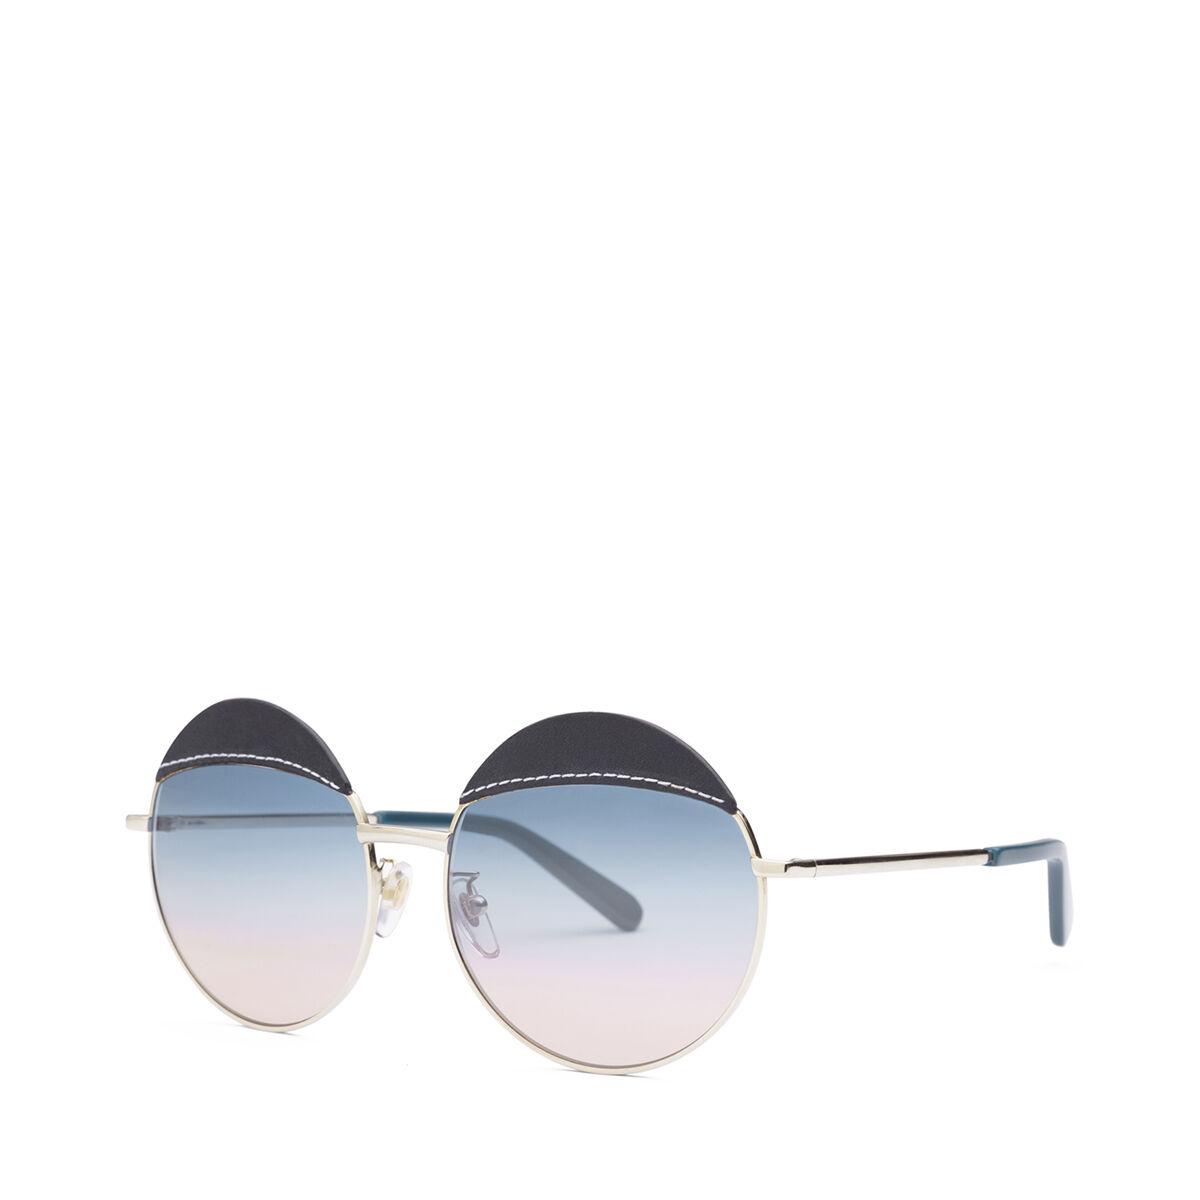 LOEWE Round Sticth Sunglasses Blue/Blue Gradient Peach front